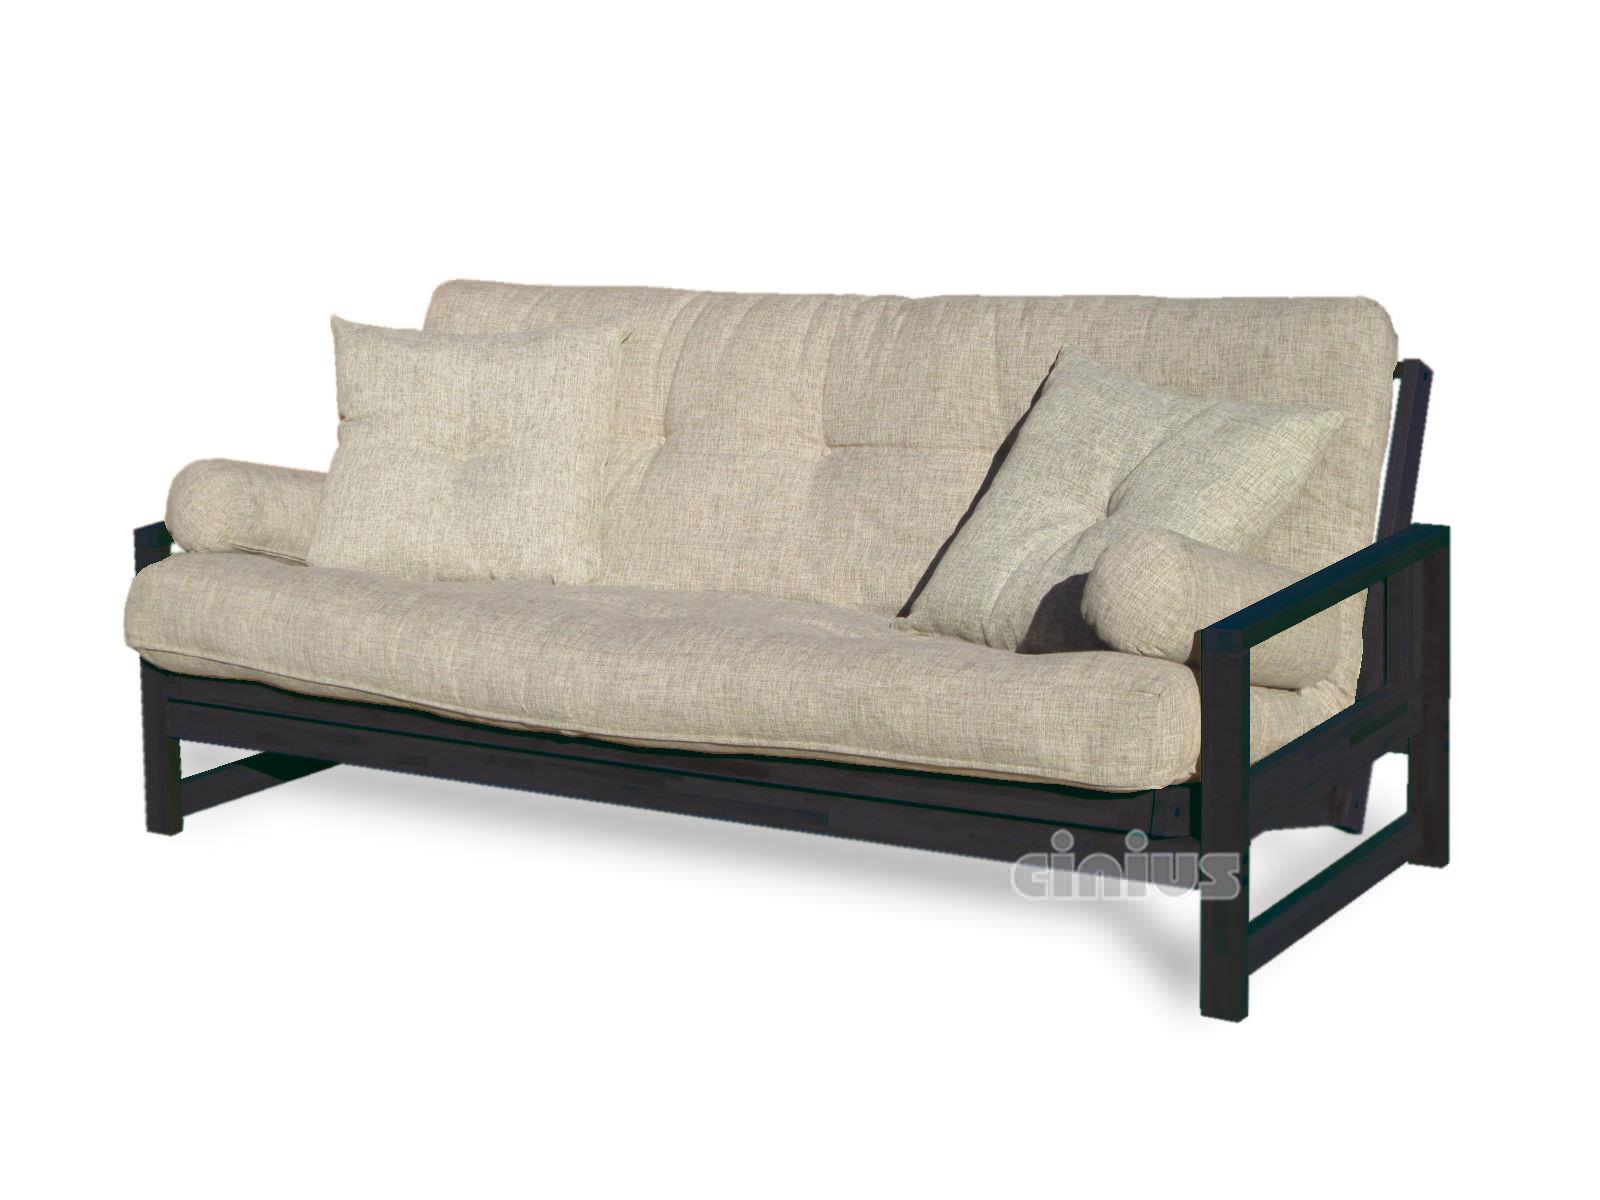 Divan Lits : Divan lit futon futon shiatsu literie